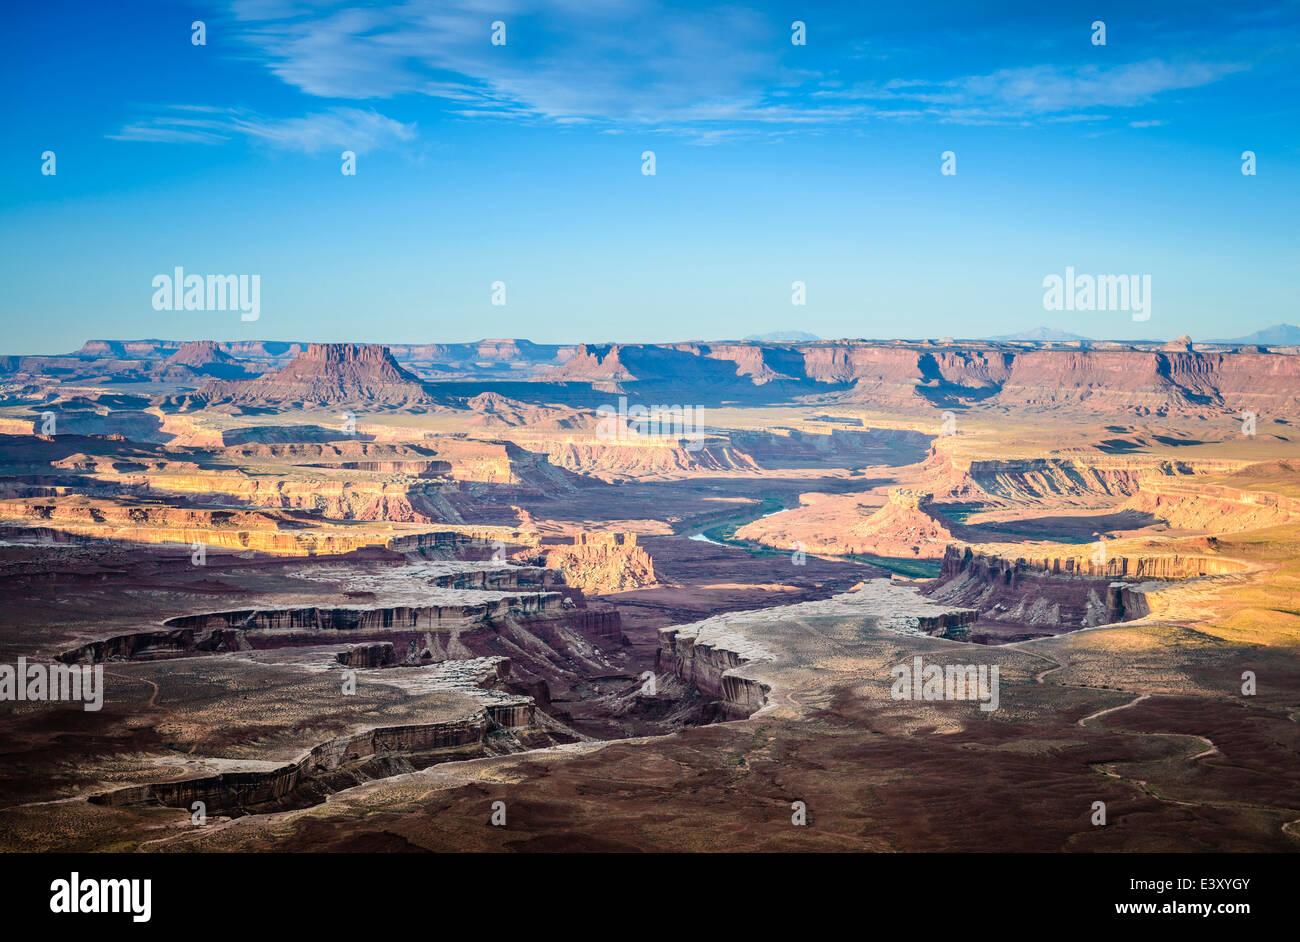 Aerial view of Horseshoe Bend, Canyonlands, Utah, United States - Stock Image